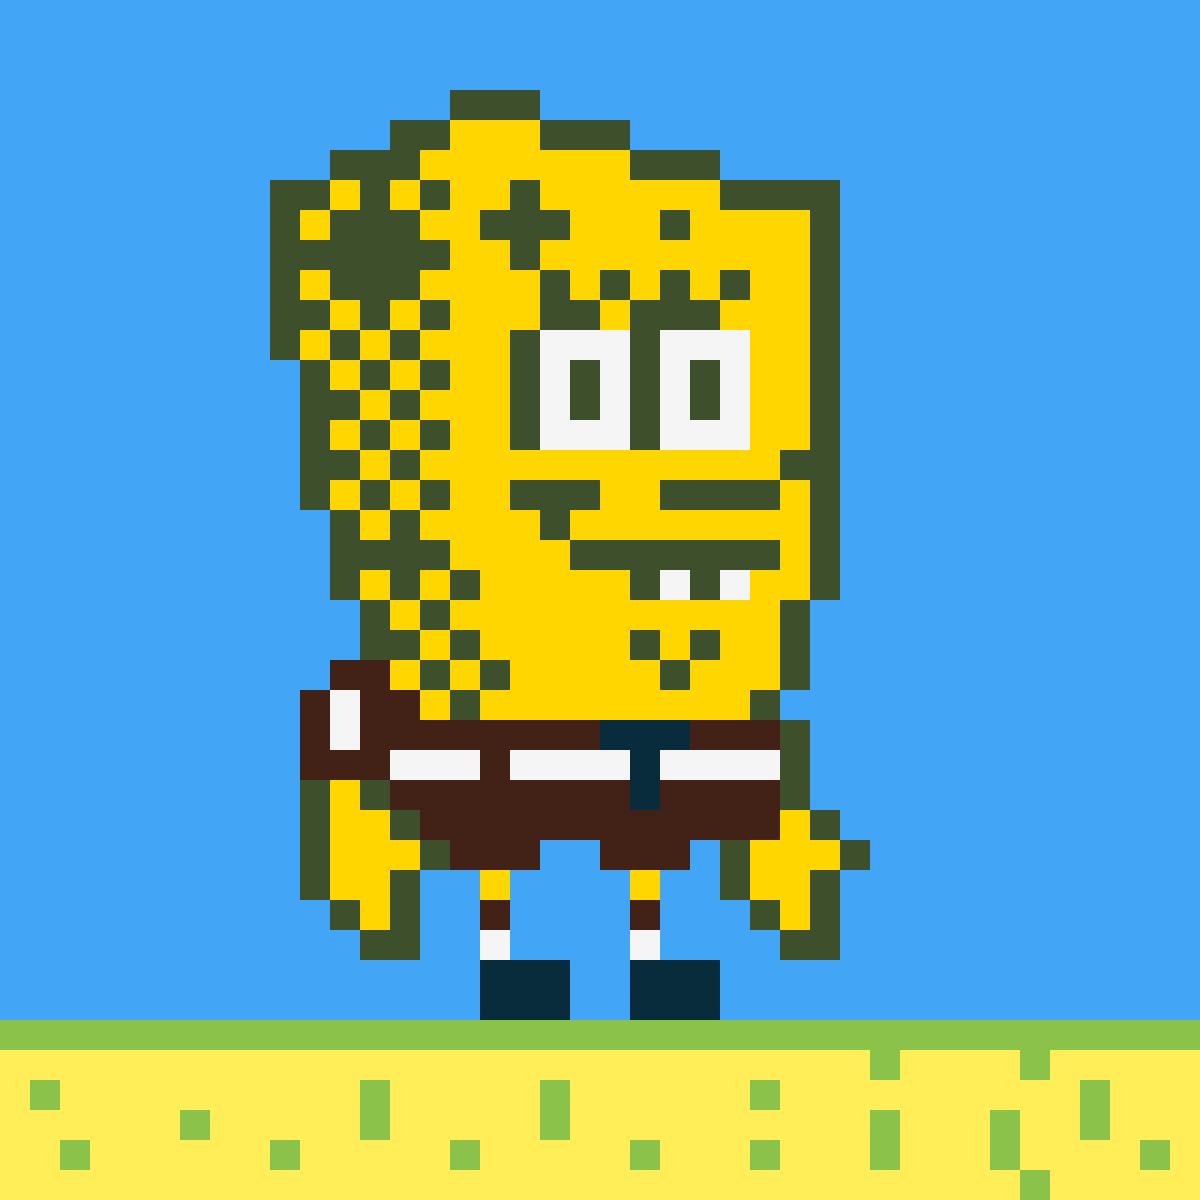 Editing 8 Bit Spongebob Squarepants Free Online Pixel Art Drawing Tool Pixilart